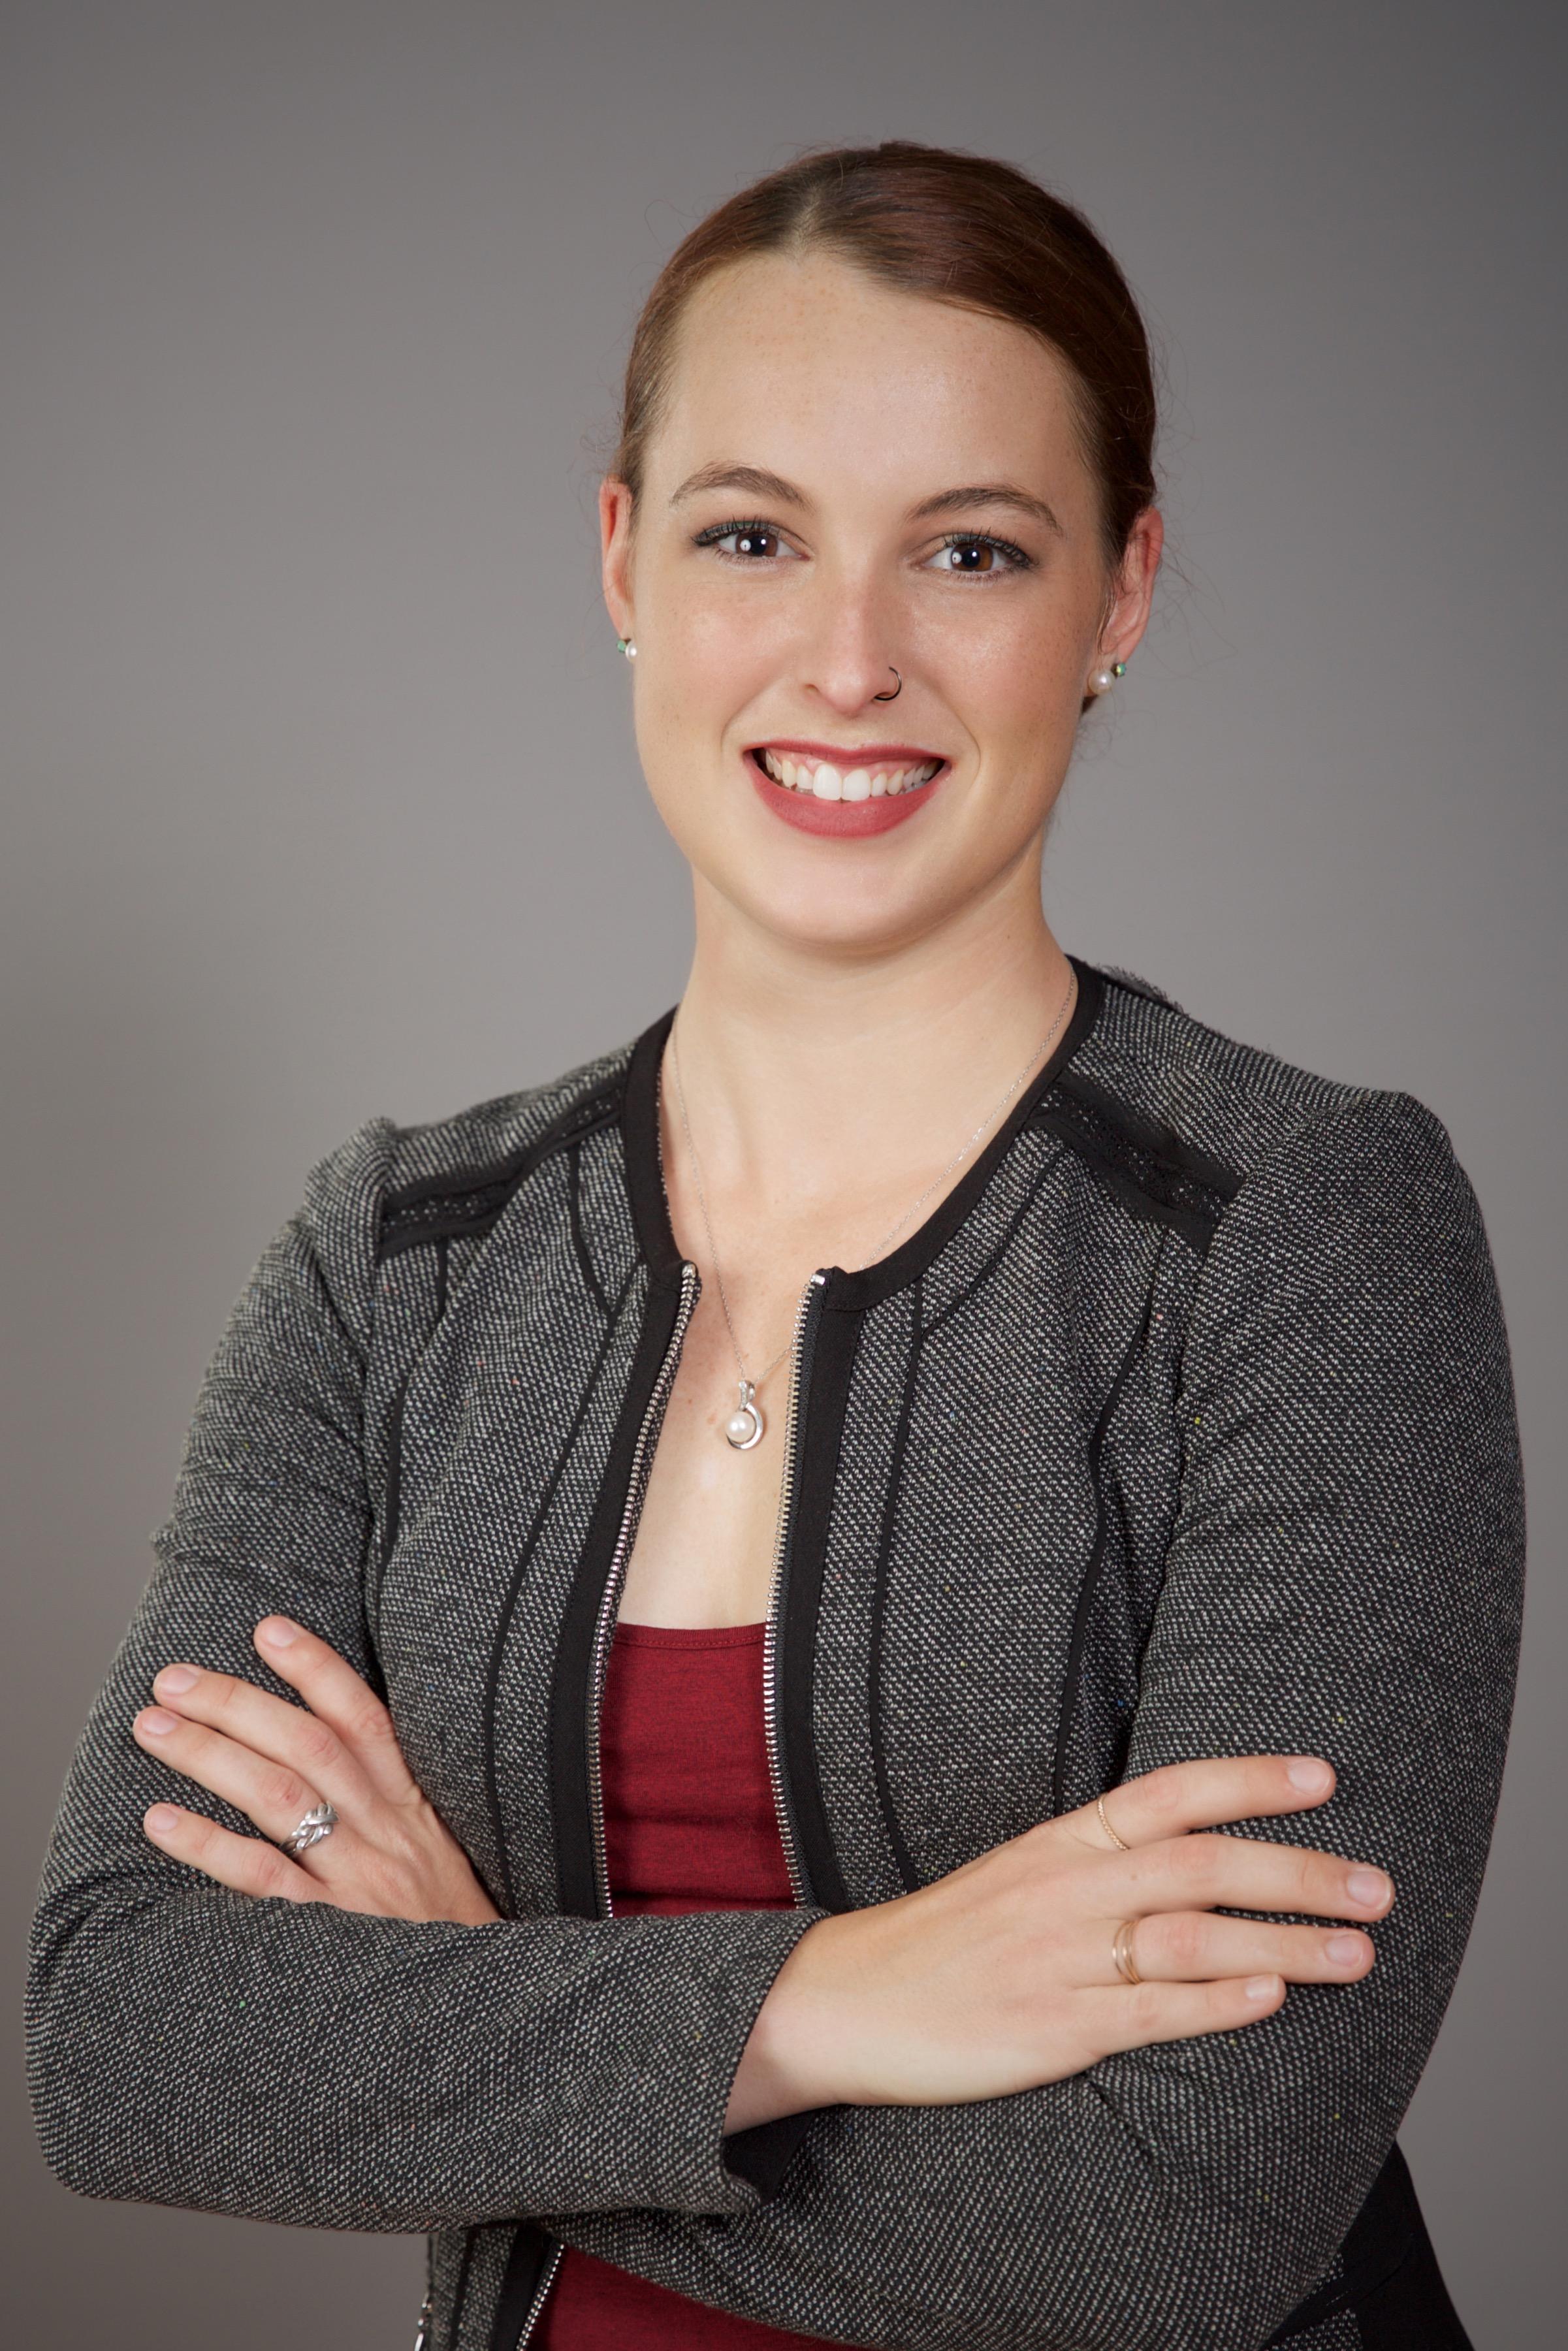 Rachel Flanagan